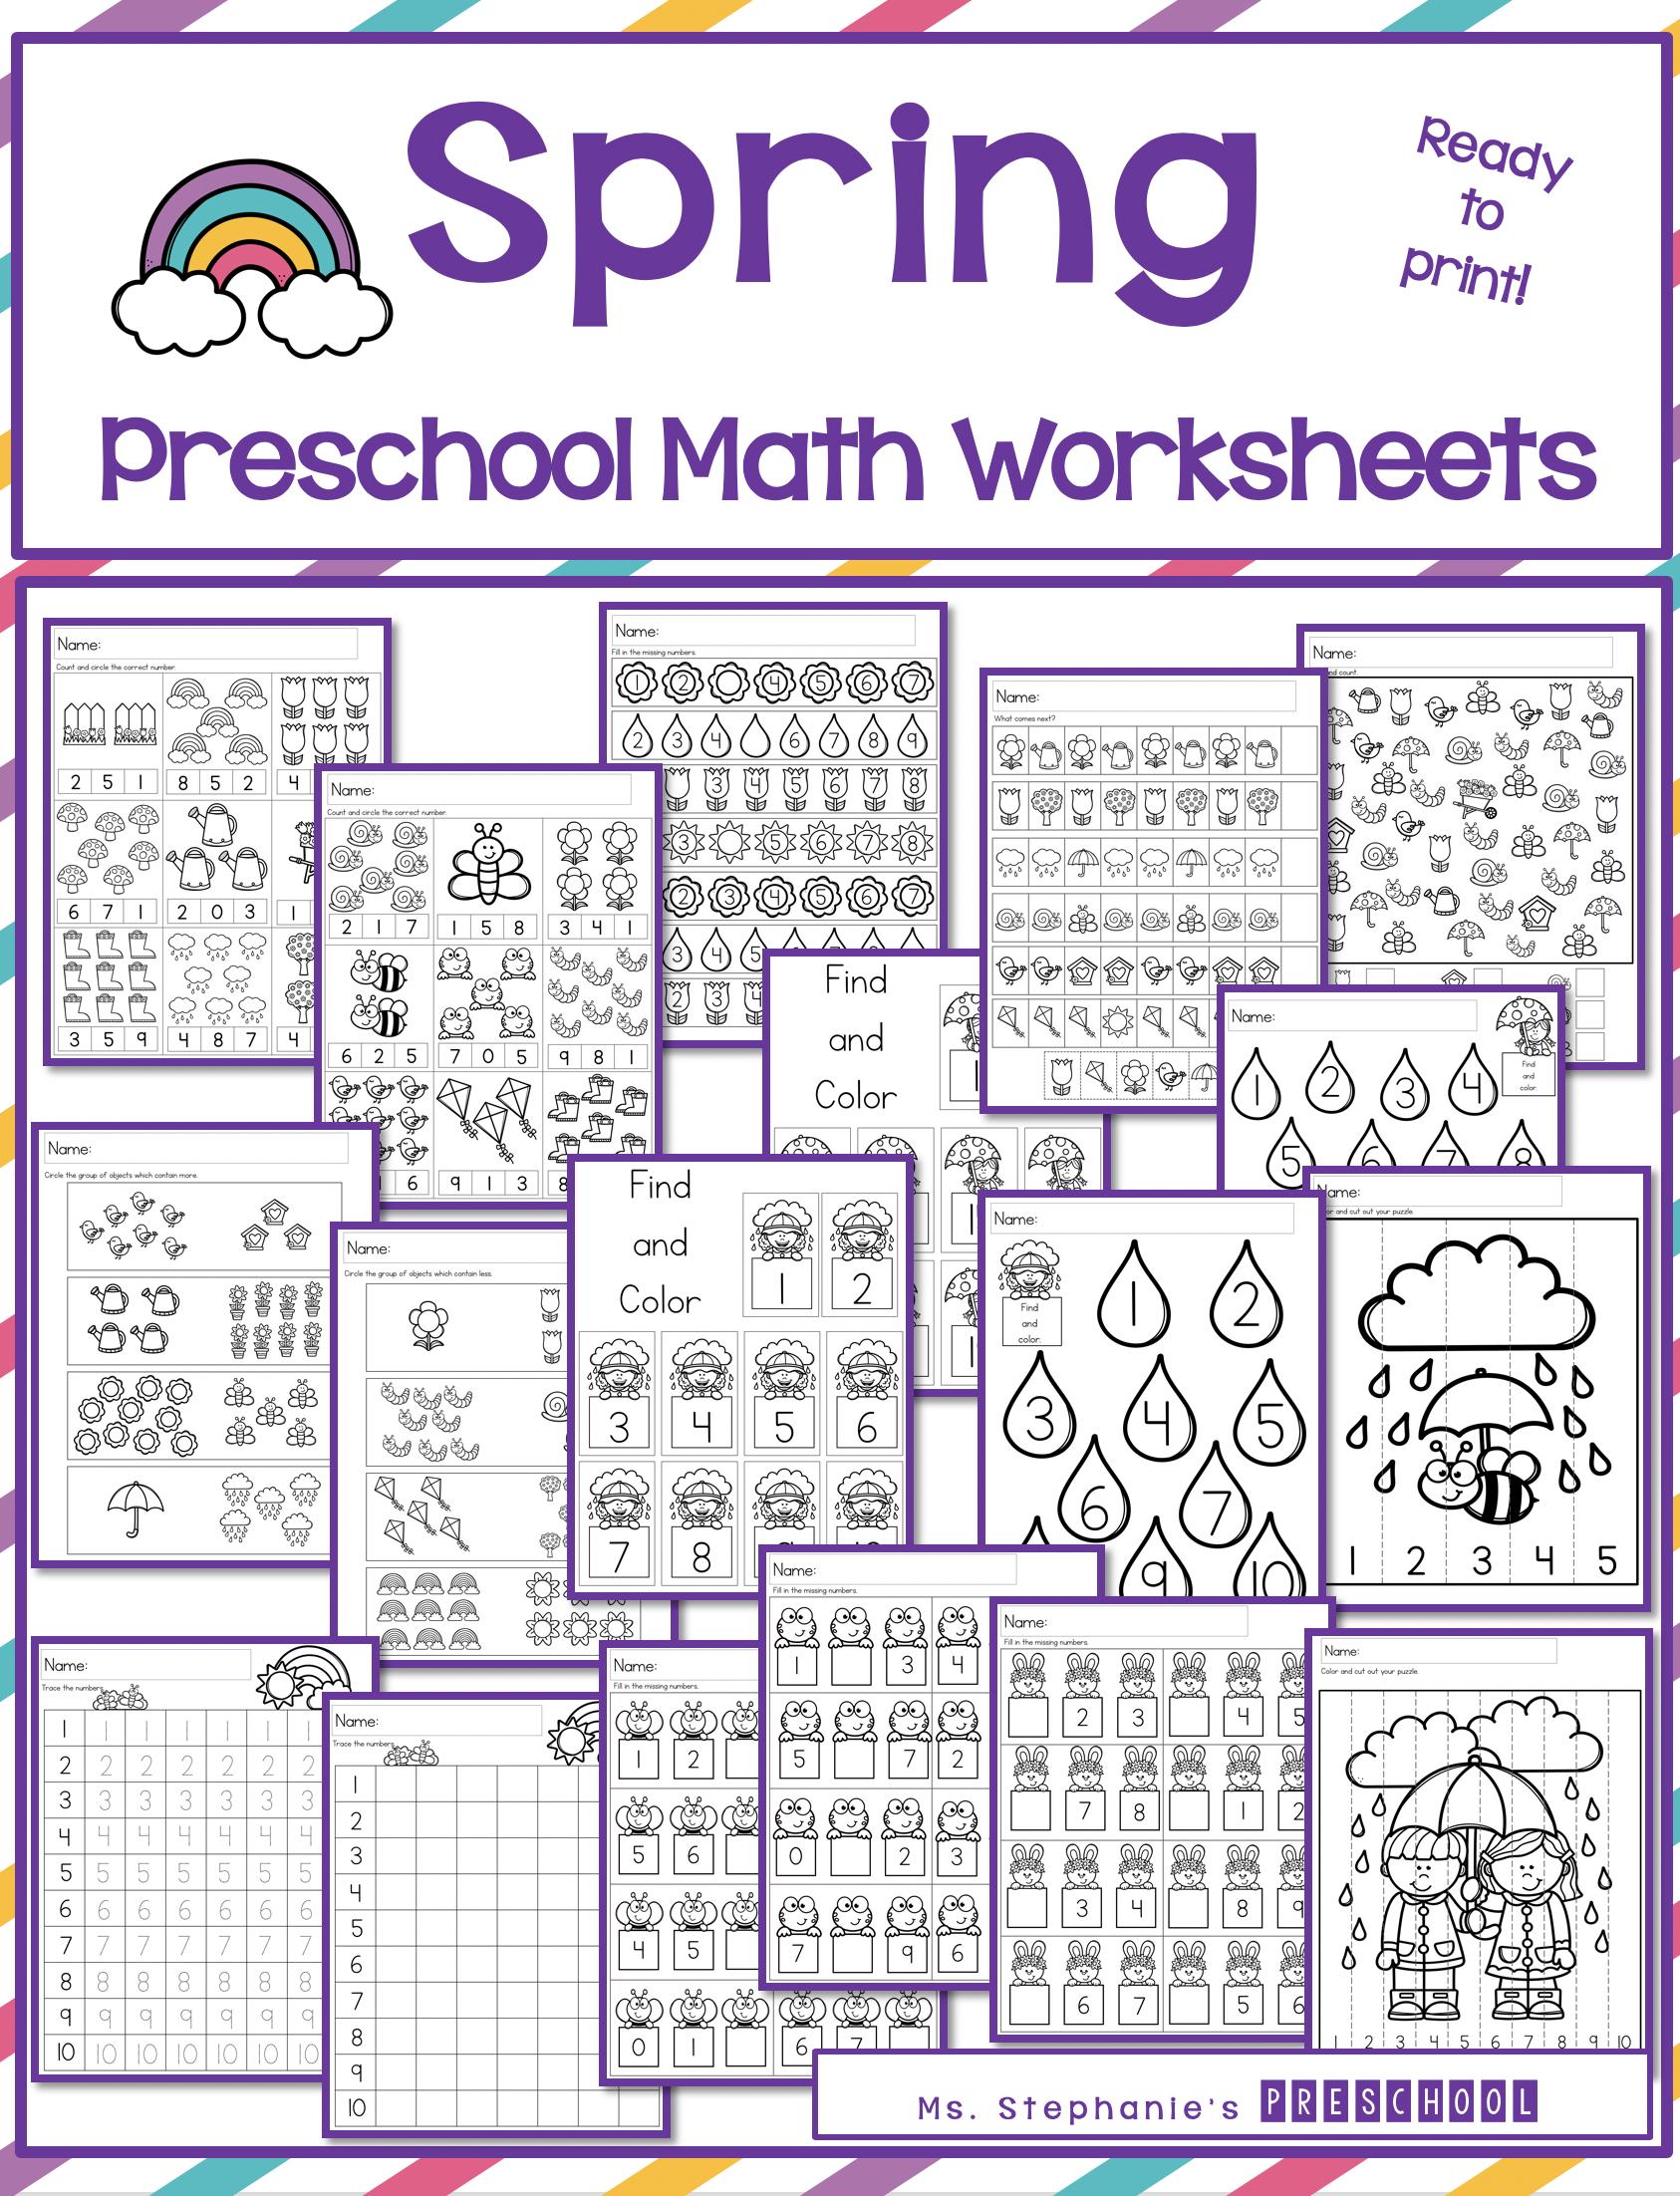 Spring Preschool Math Worksheets Spring Worksheets Preschool Preschool Math Worksheets Spring Preschool [ 2204 x 1686 Pixel ]